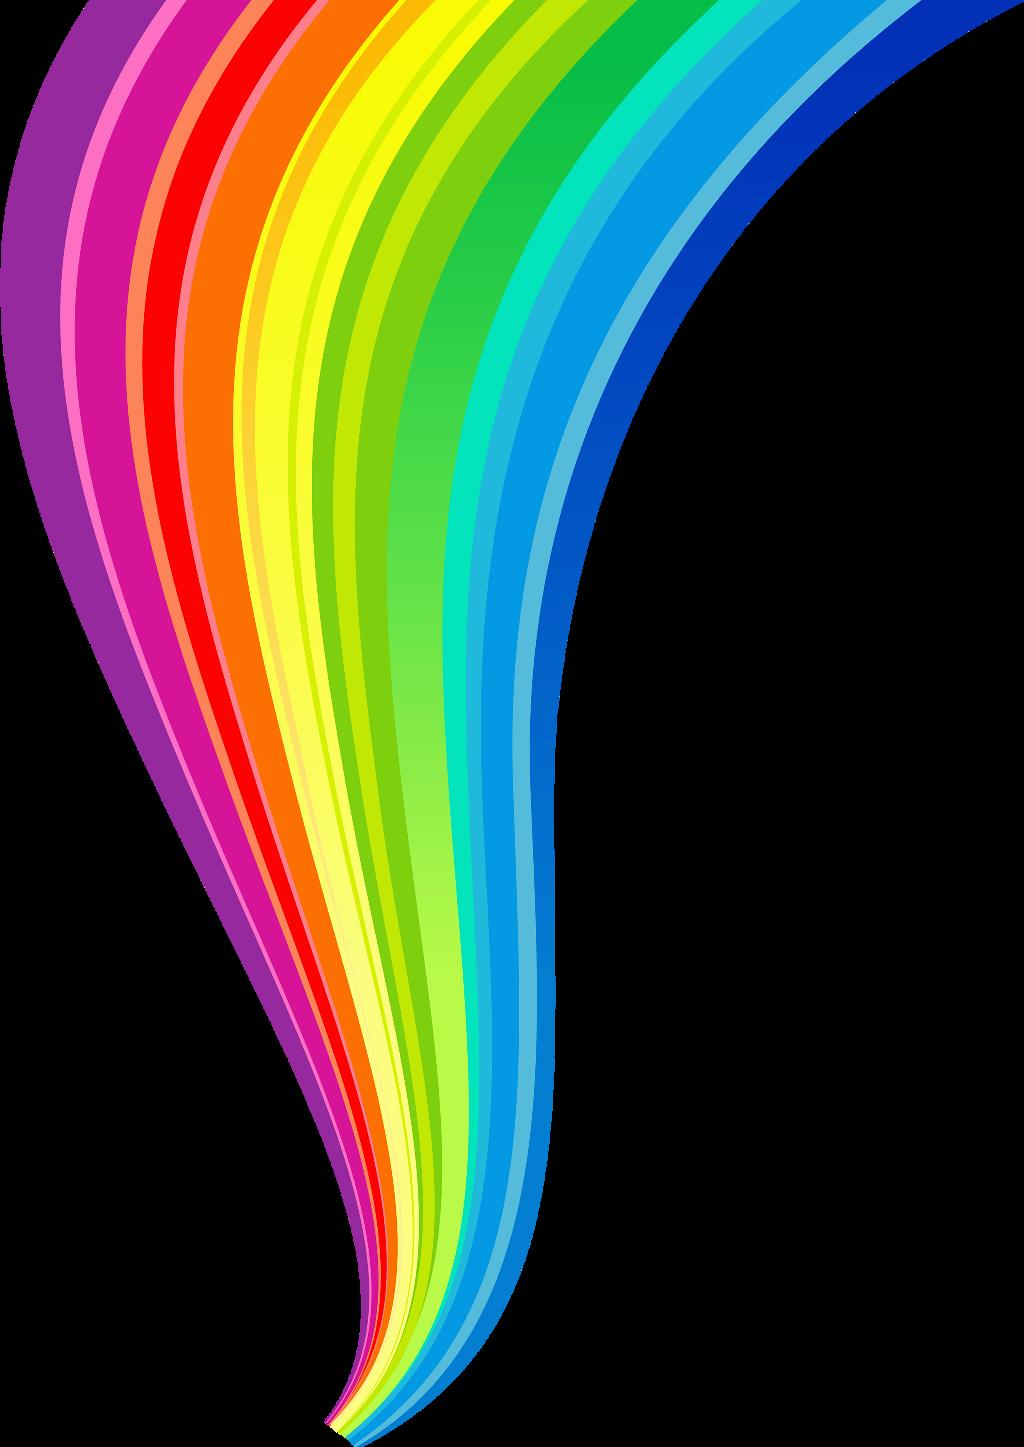 #rainbow #rainbowoverlay #freetoedit